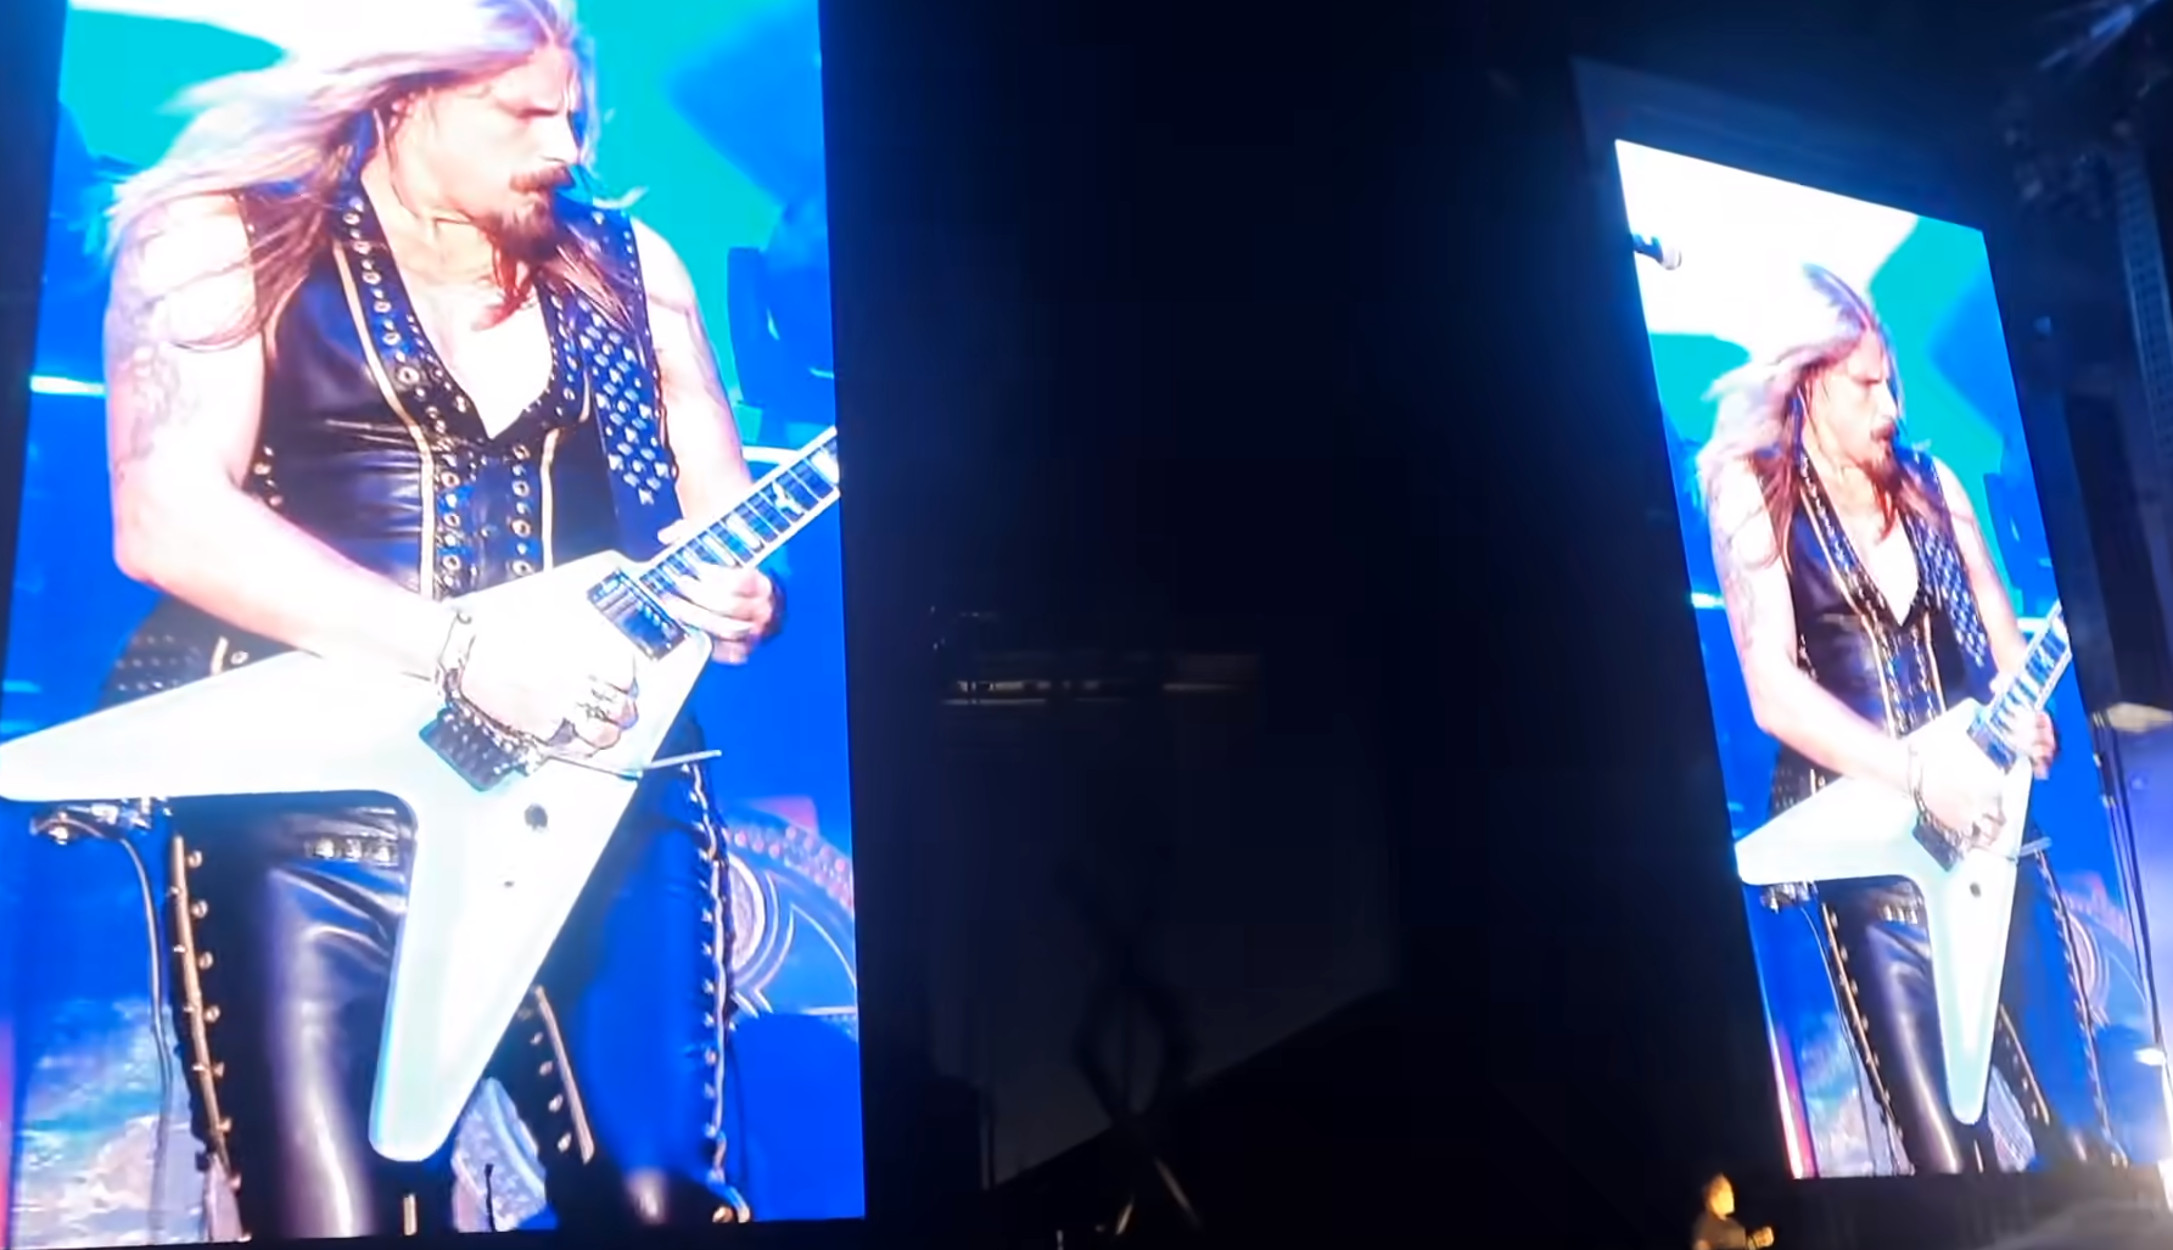 Judas Priest: Ο κιθαρίστας έπαθε ανεύρυσμα πάνω στην σκηνή! Βίντεο- ντοκουμέντο από την συναυλία